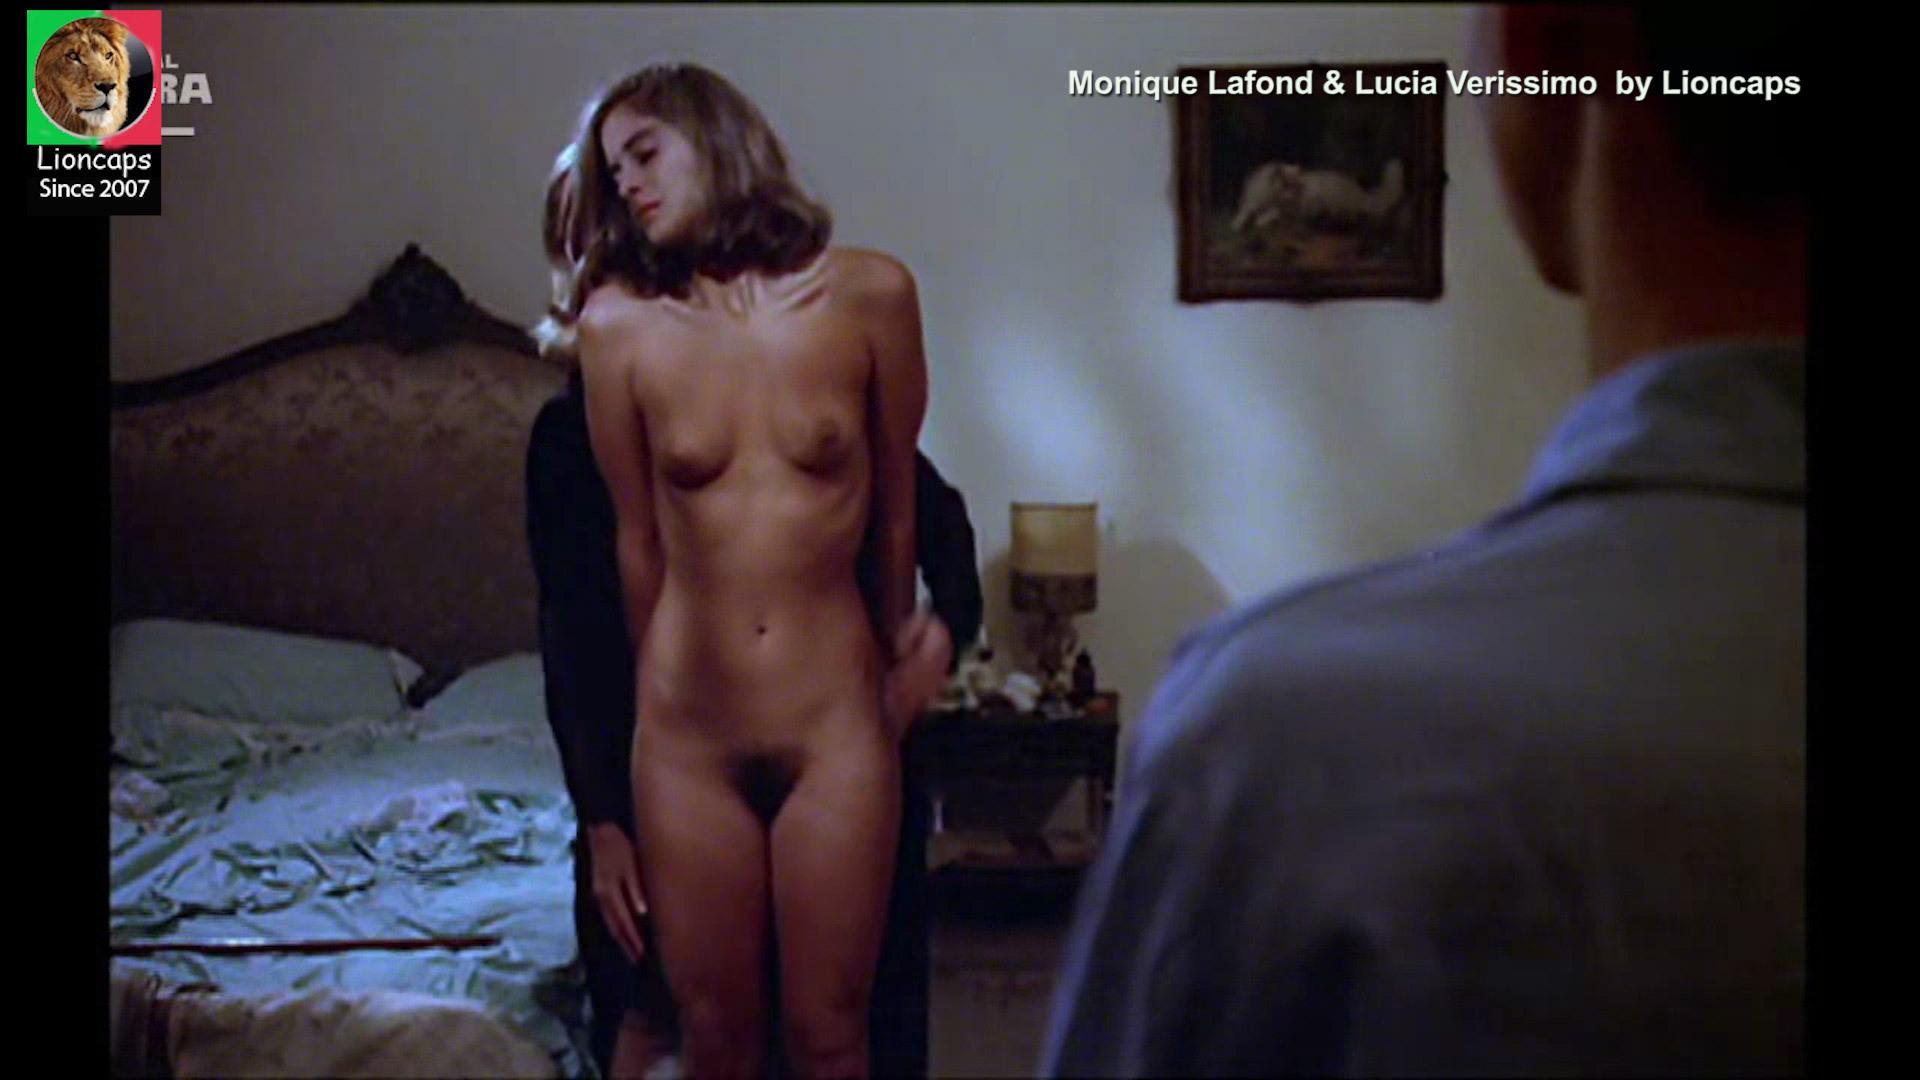 lucia_verissimo_monique_lafond_feras_lioncaps_14_02_2021 (3).jpg